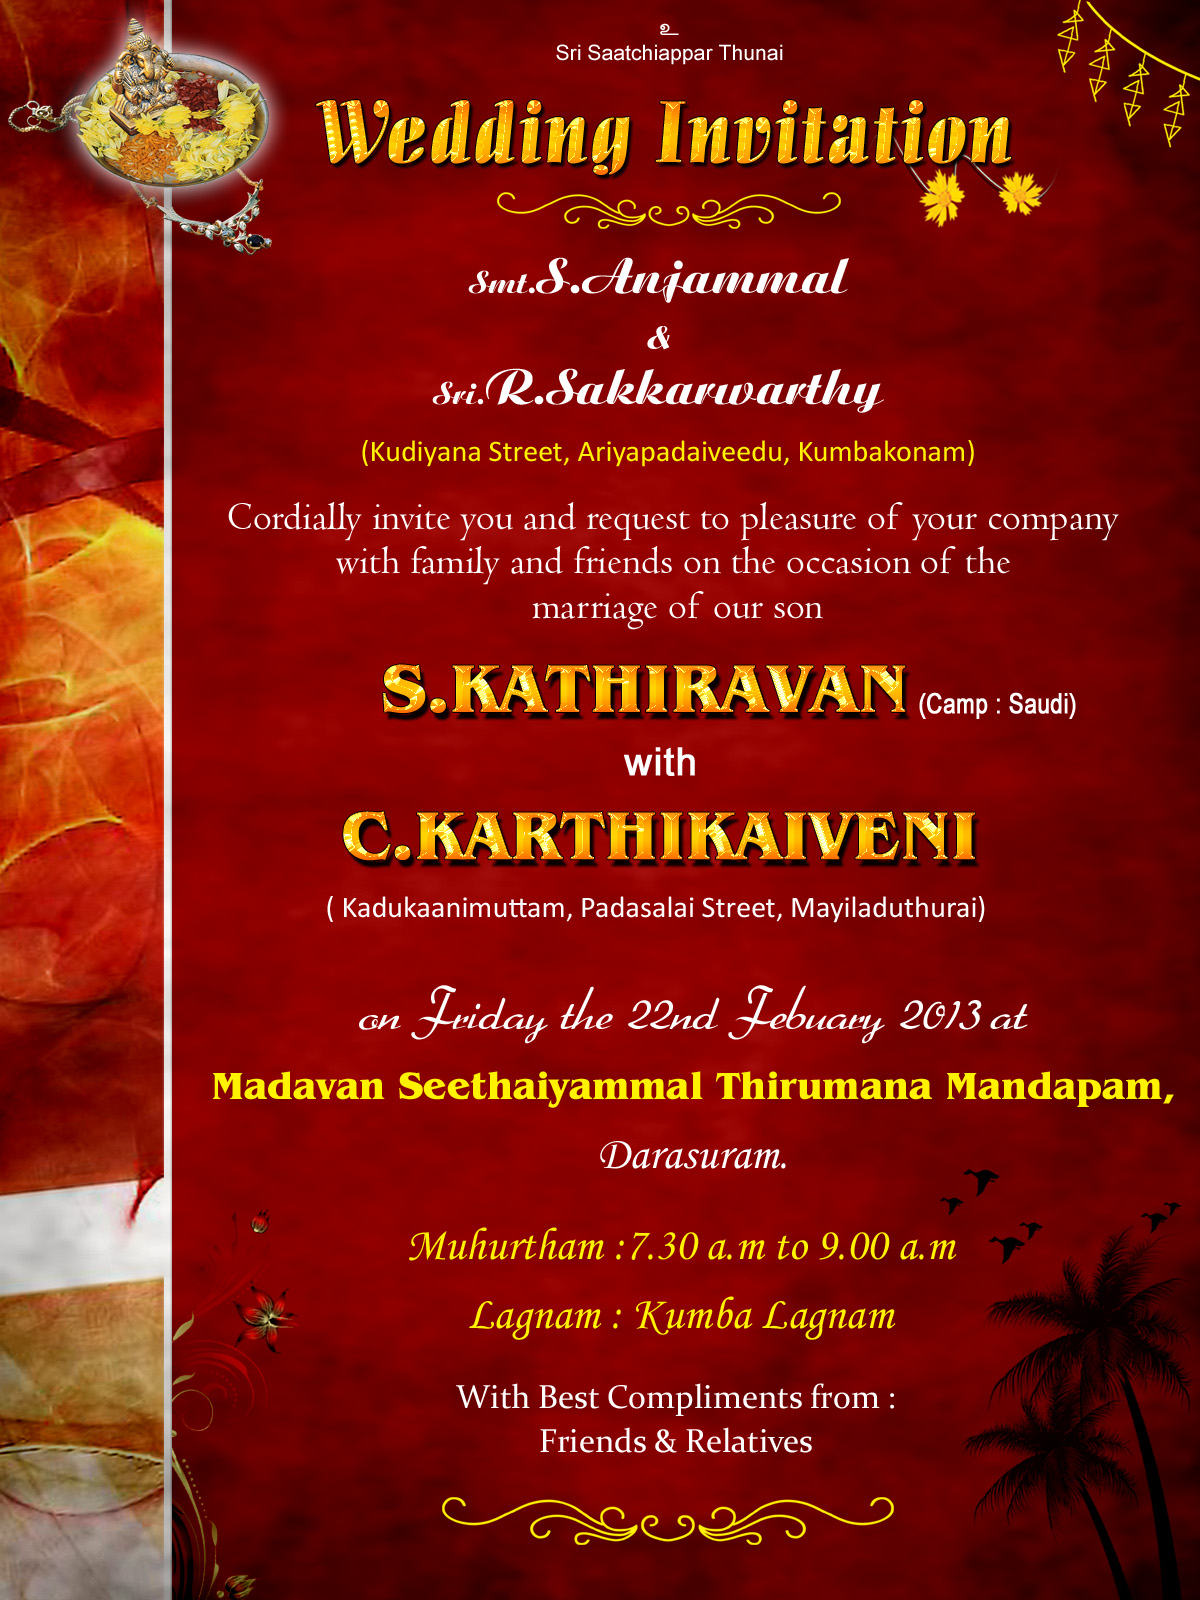 graphic design wedding wishes invitation  thanks card